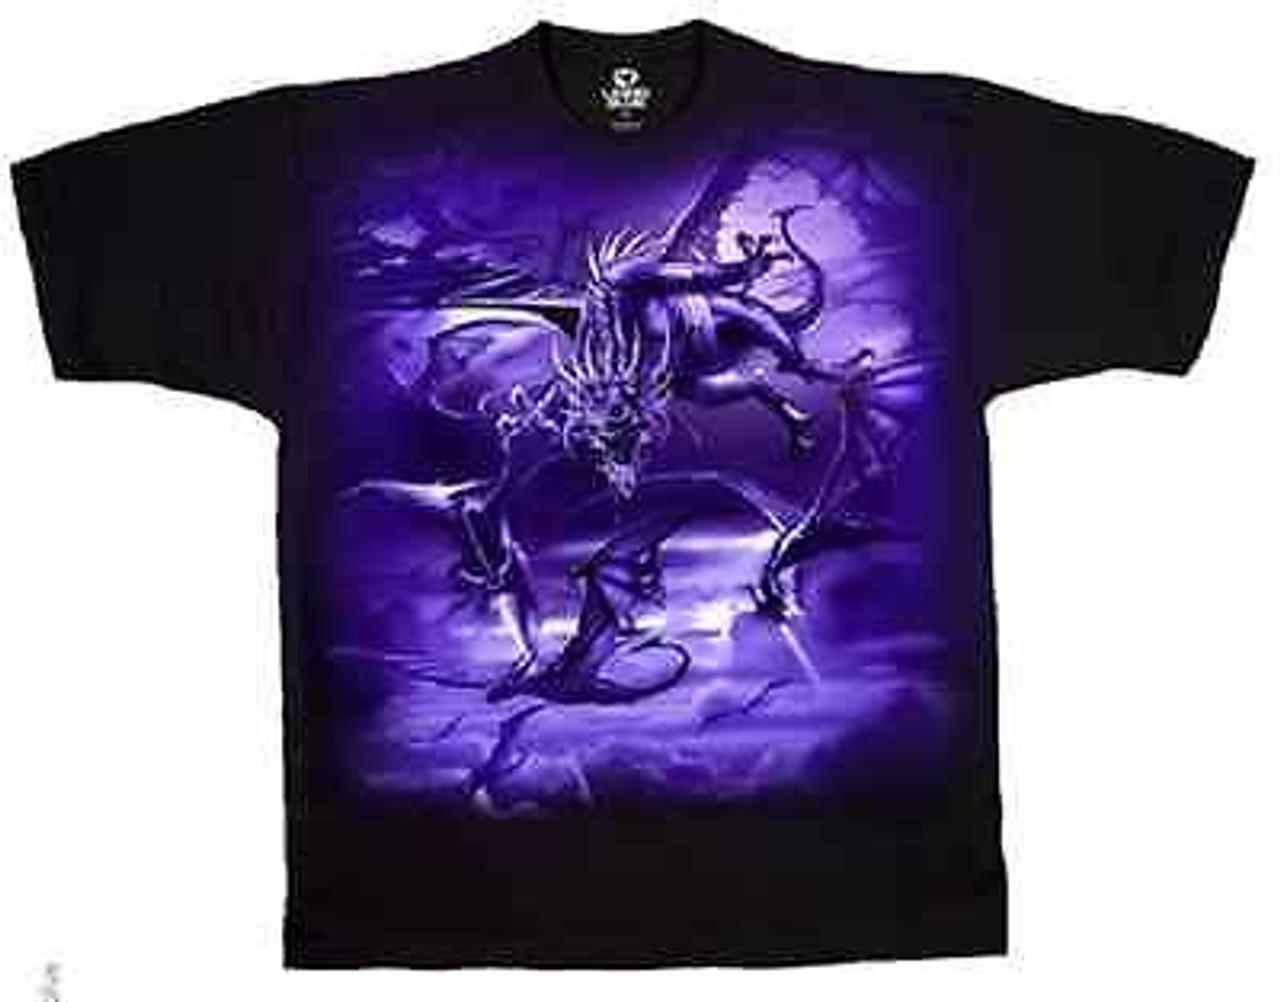 fc397be9748936 Dark Fantasy The Swarm Dragons Purple Sky Dark Force Evil Black Shirt L-2Xl